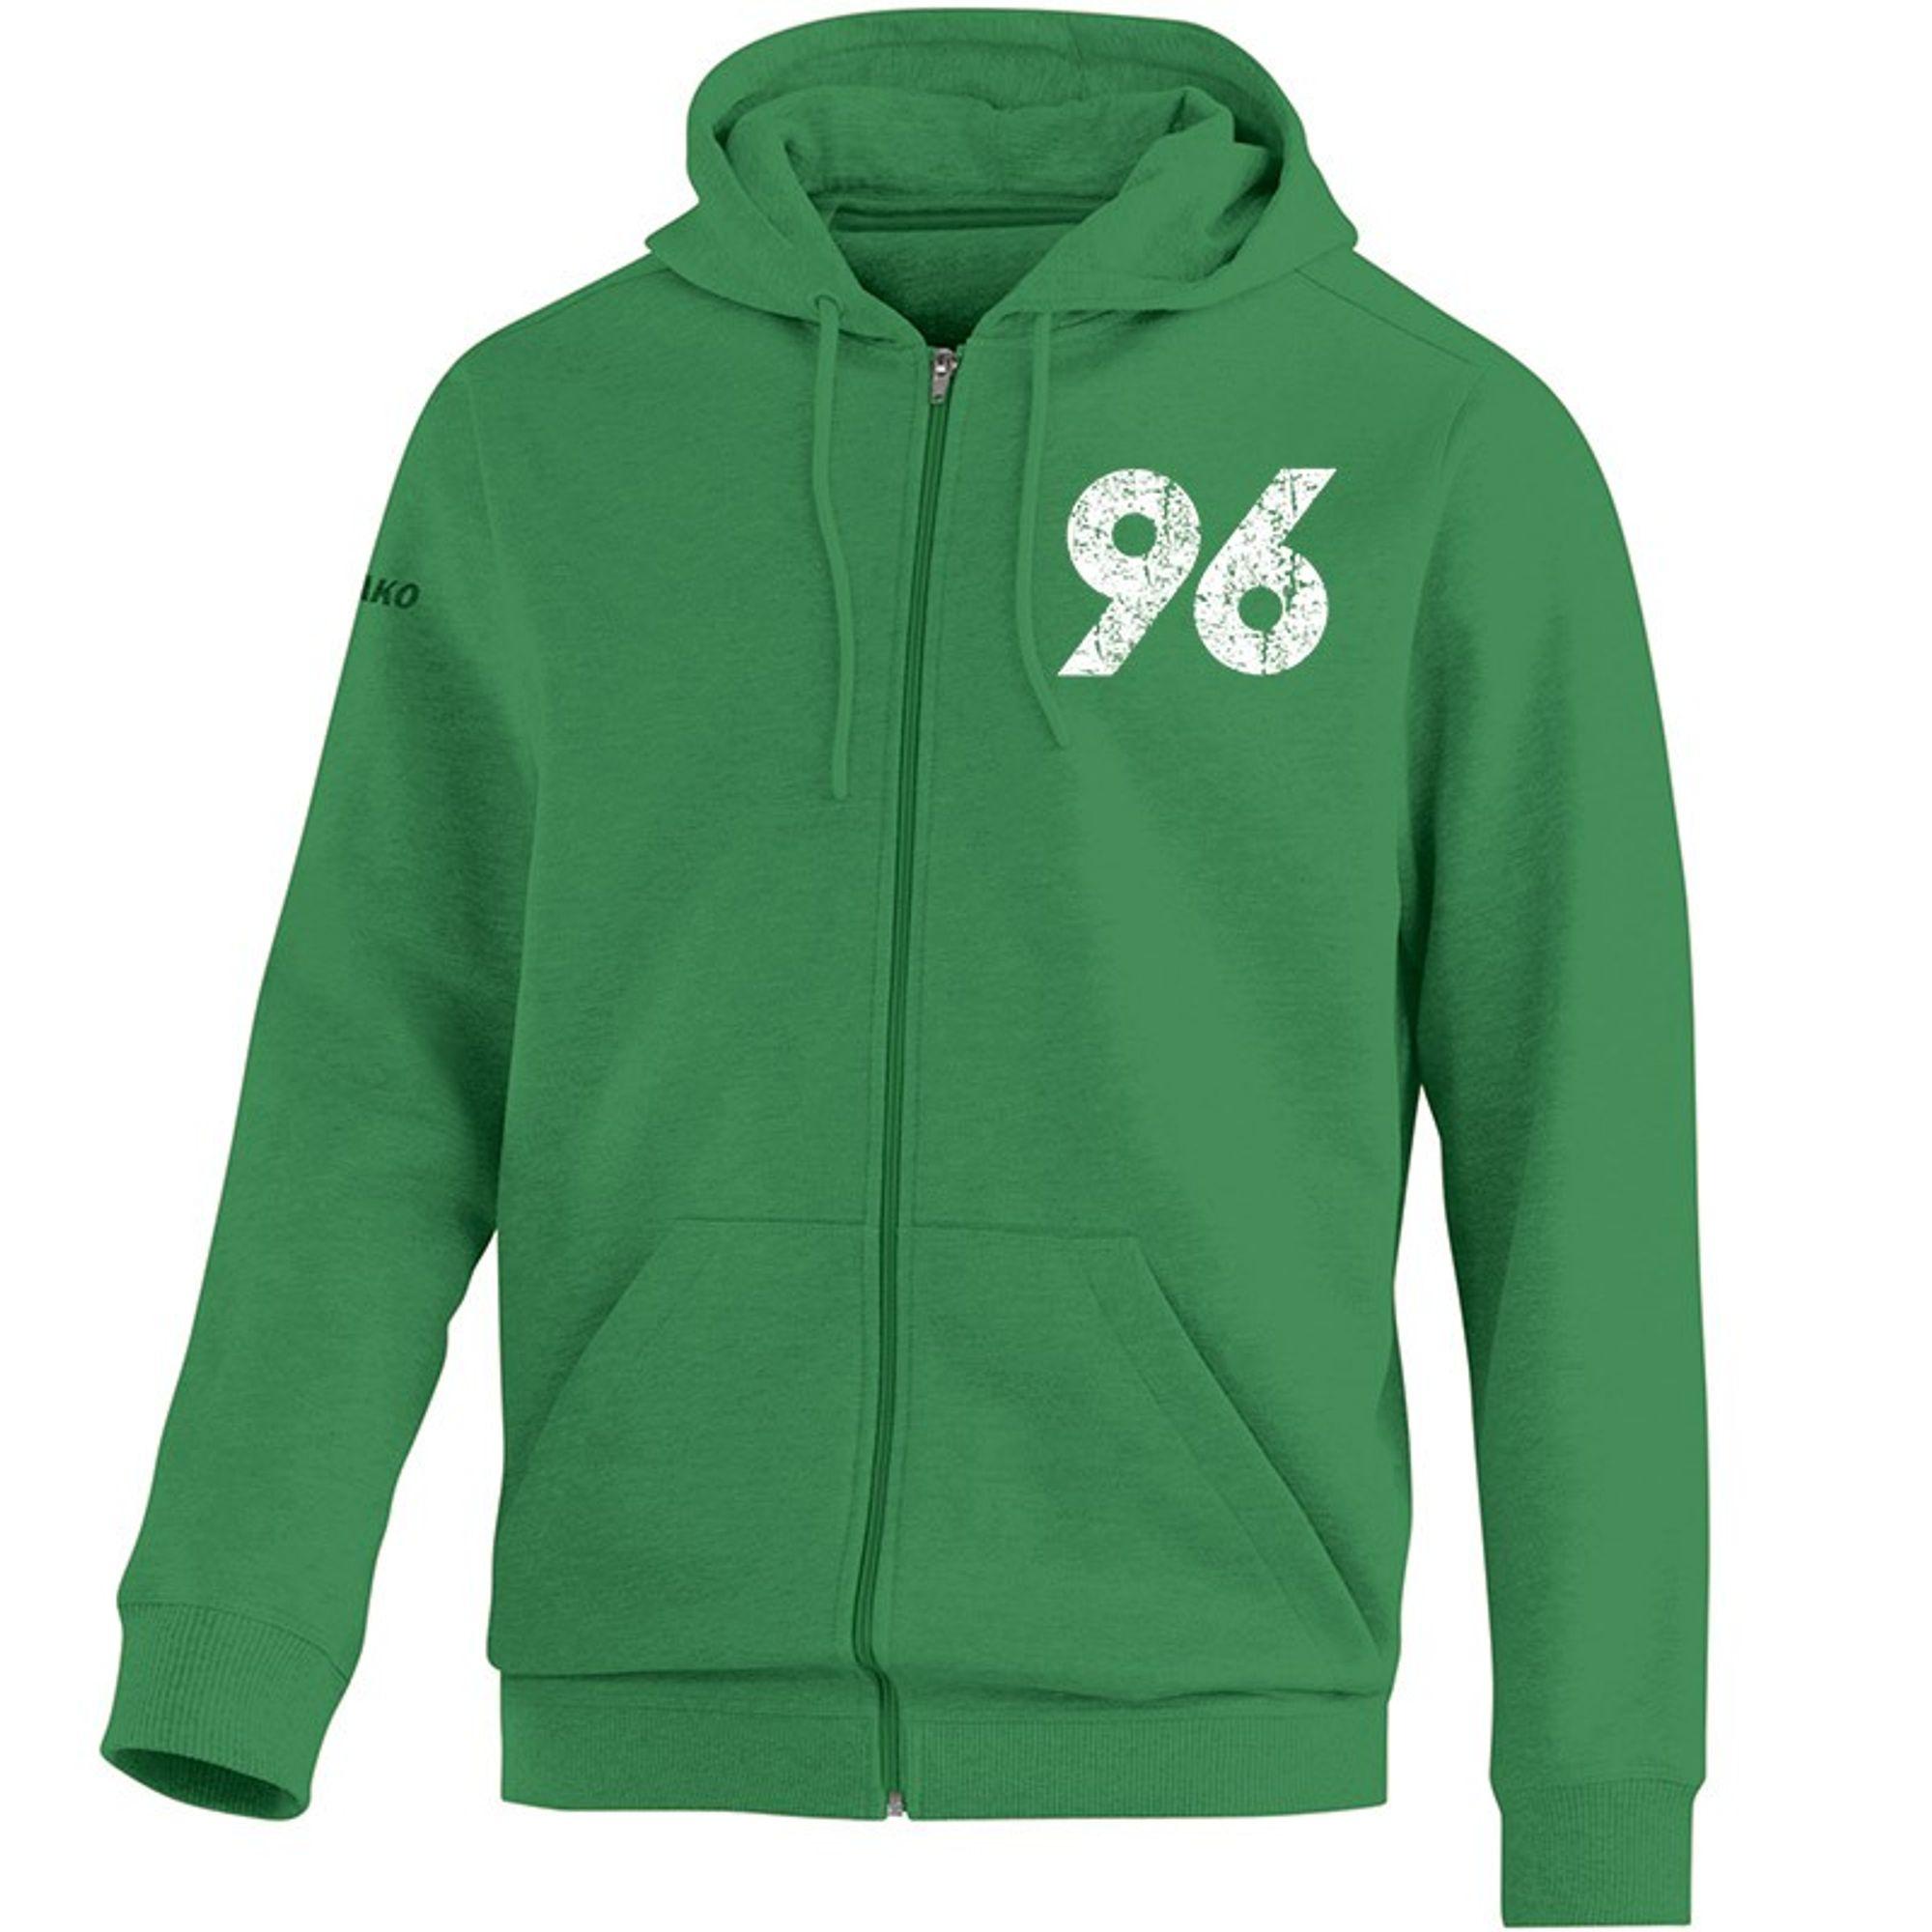 Jako Hannover 96 Kapuzenjacke !!Vintage!! Saison 2015/2016 - grün